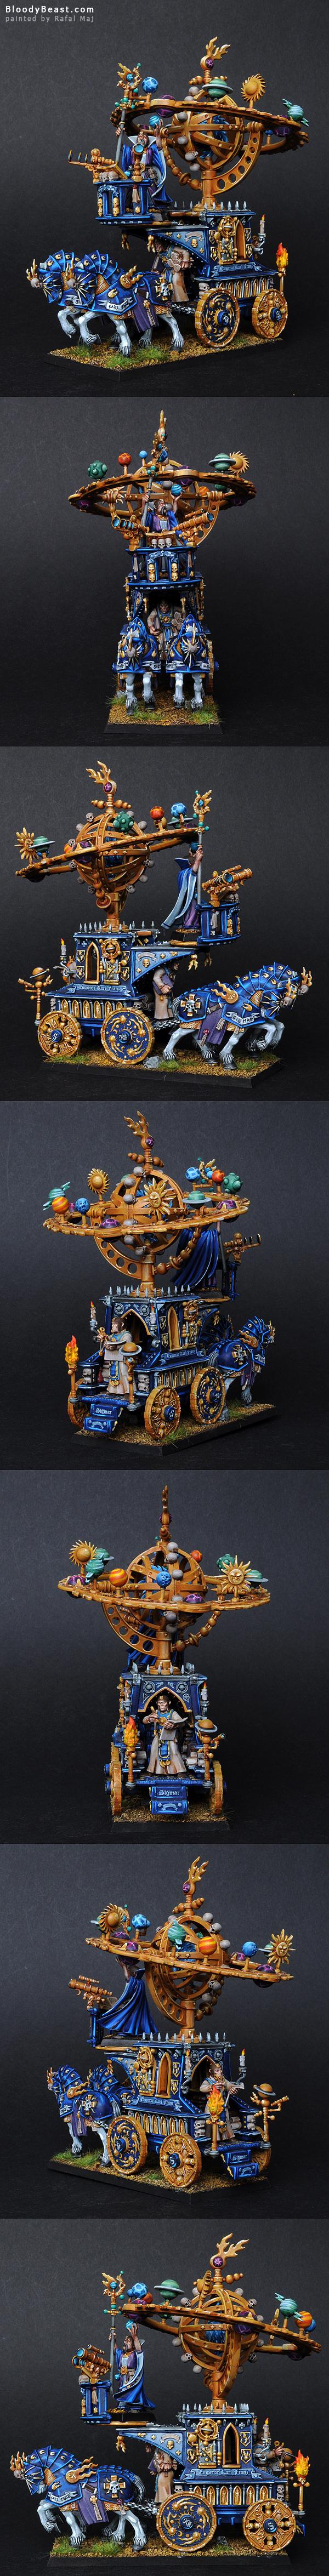 Empire Celestial Hurricanum painted by Rafal Maj (BloodyBeast.com)